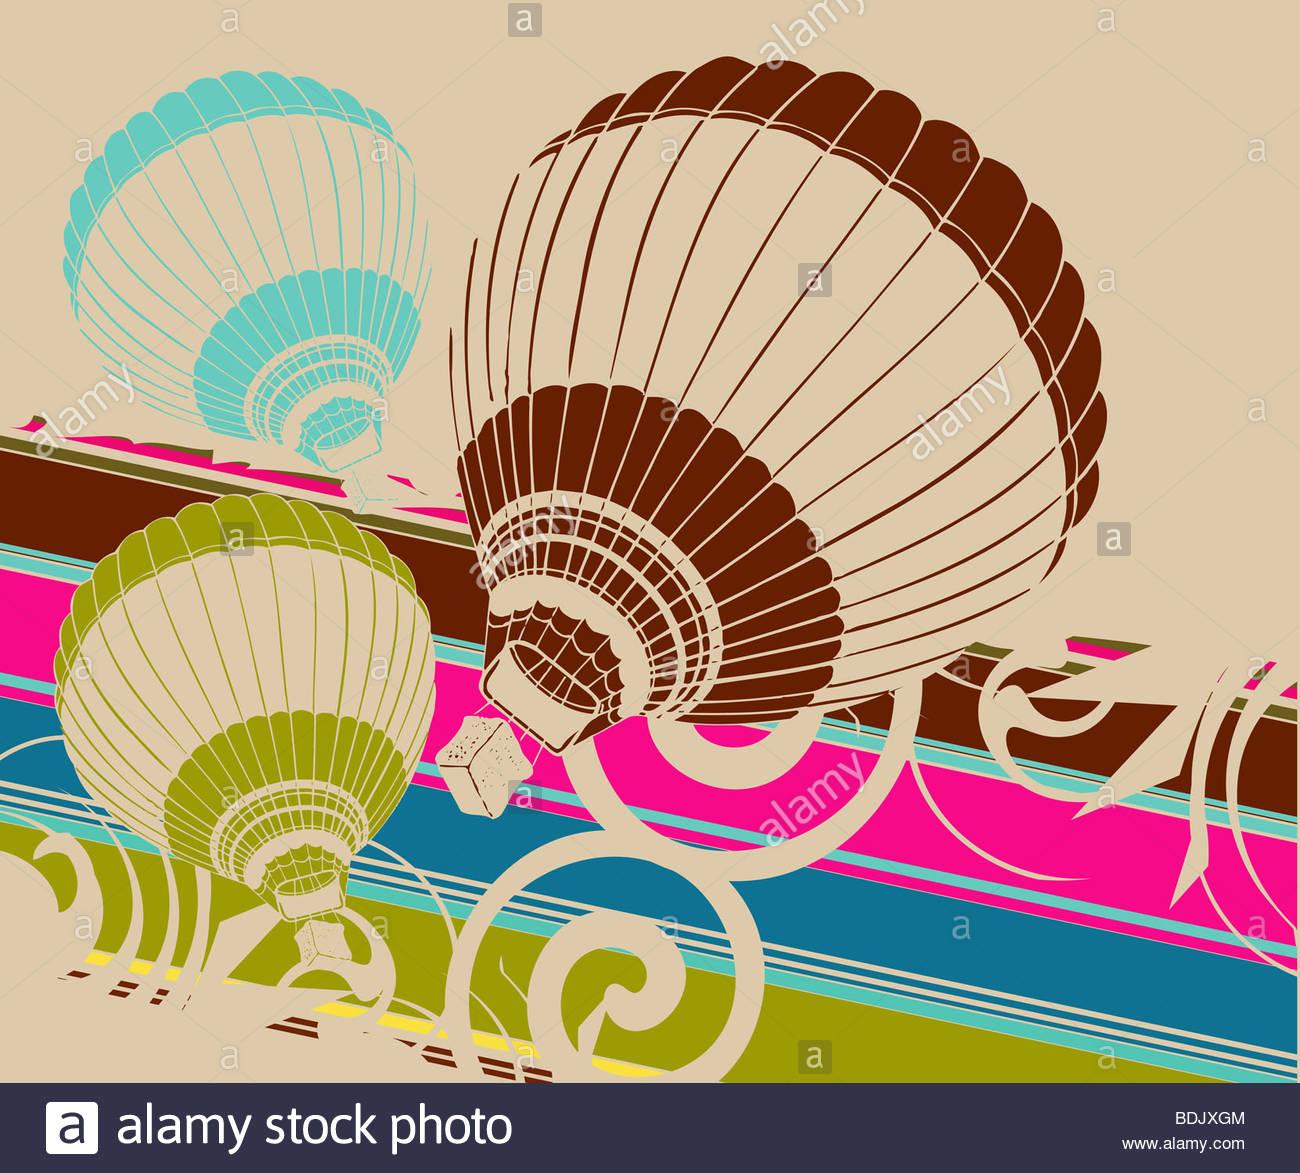 Urban Art Illustration, Vector file easy to edit or change color. Stock Foto